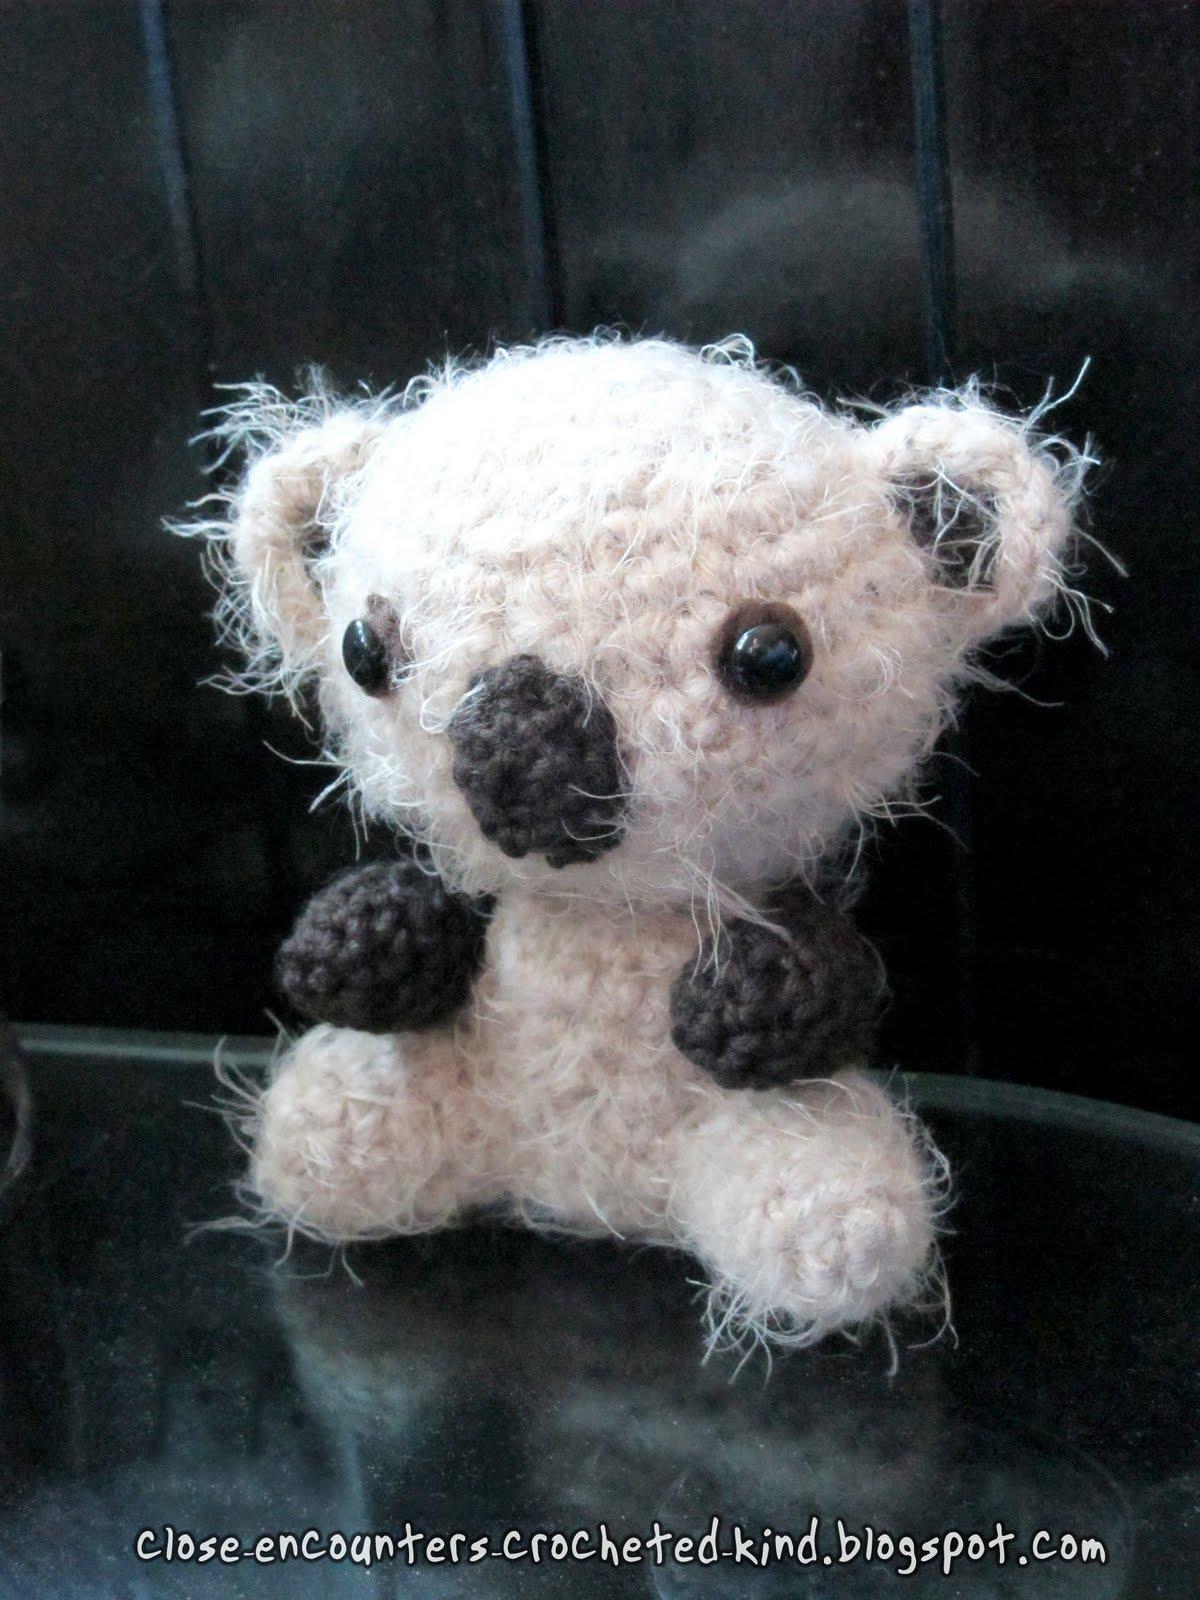 Koala Amigurumi Nose : Close Encounters: Crochet Creations by Danni Close: Fuzzy ...